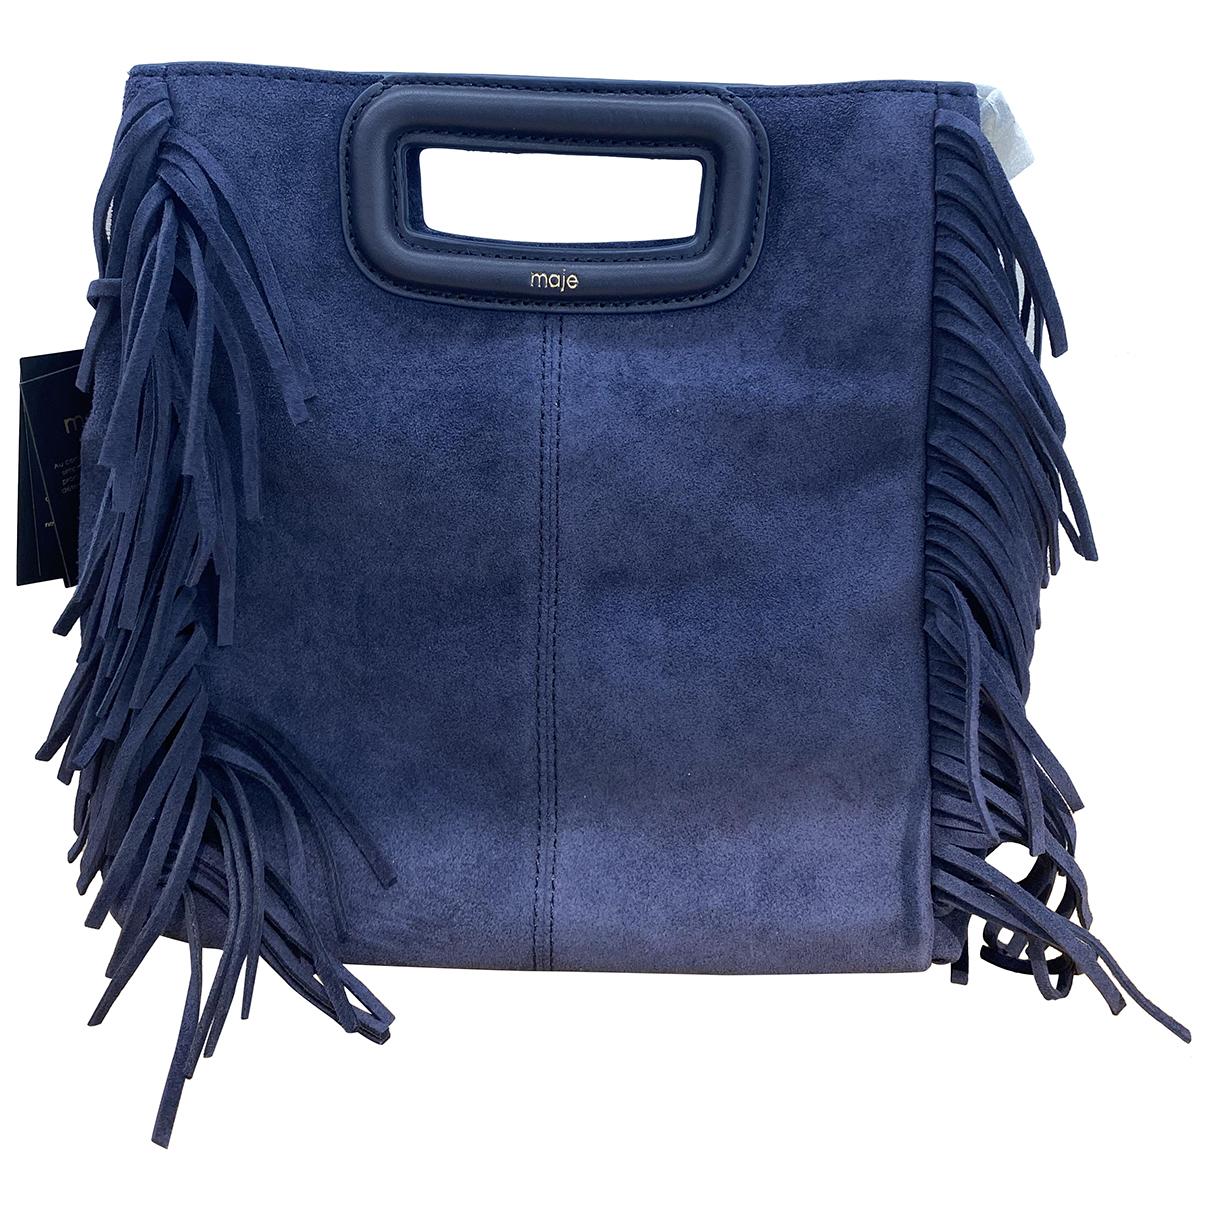 Maje Sac M Blue Suede handbag for Women N